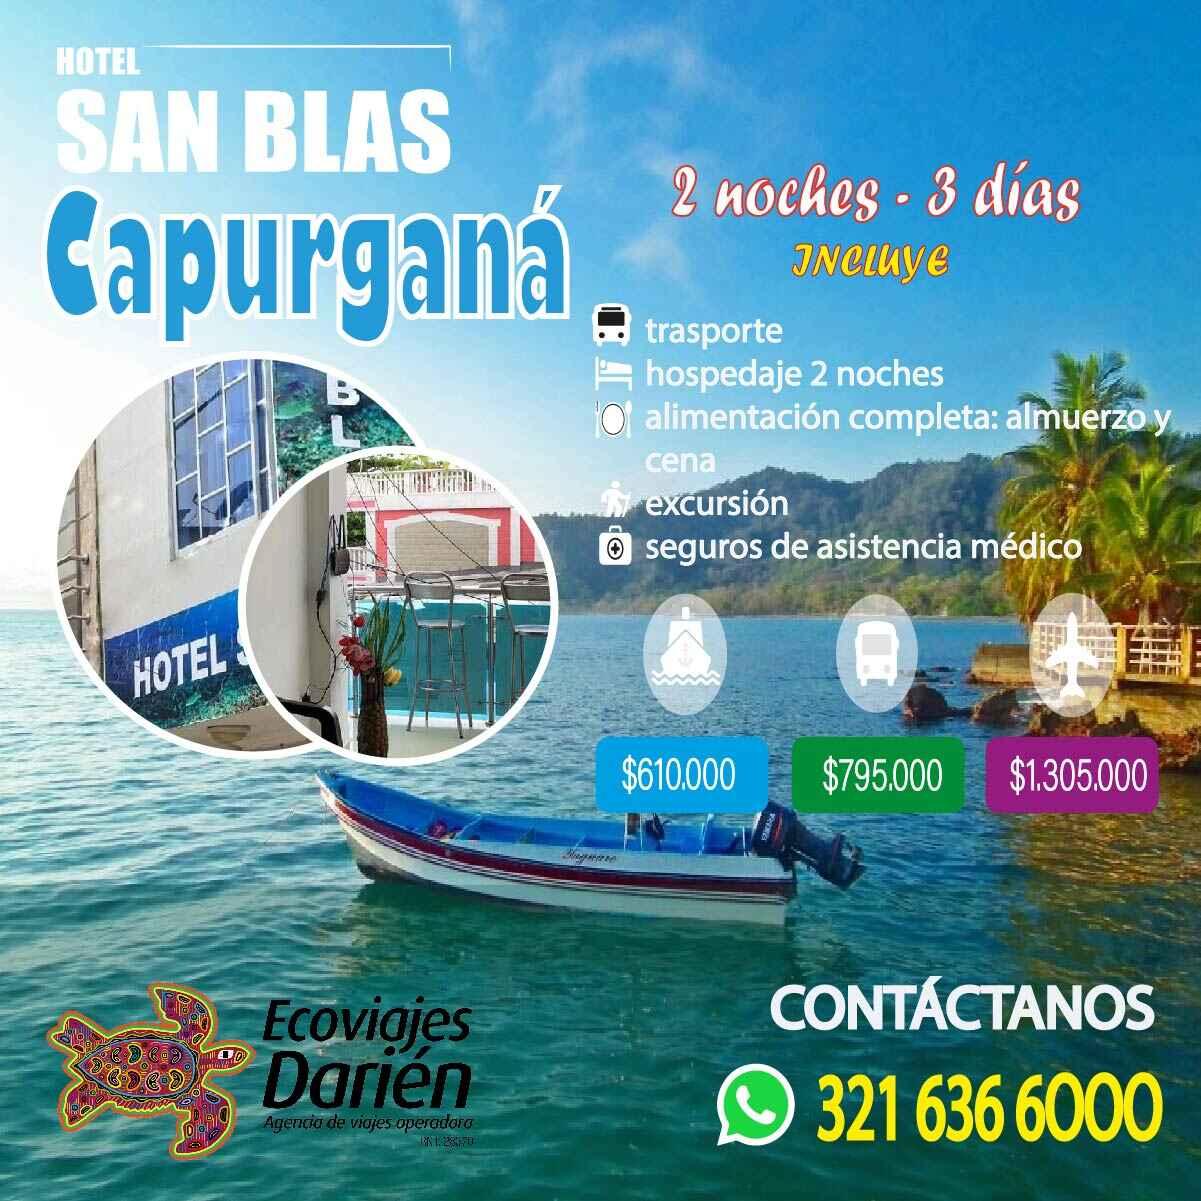 HOTEL SAN BLAS CAP